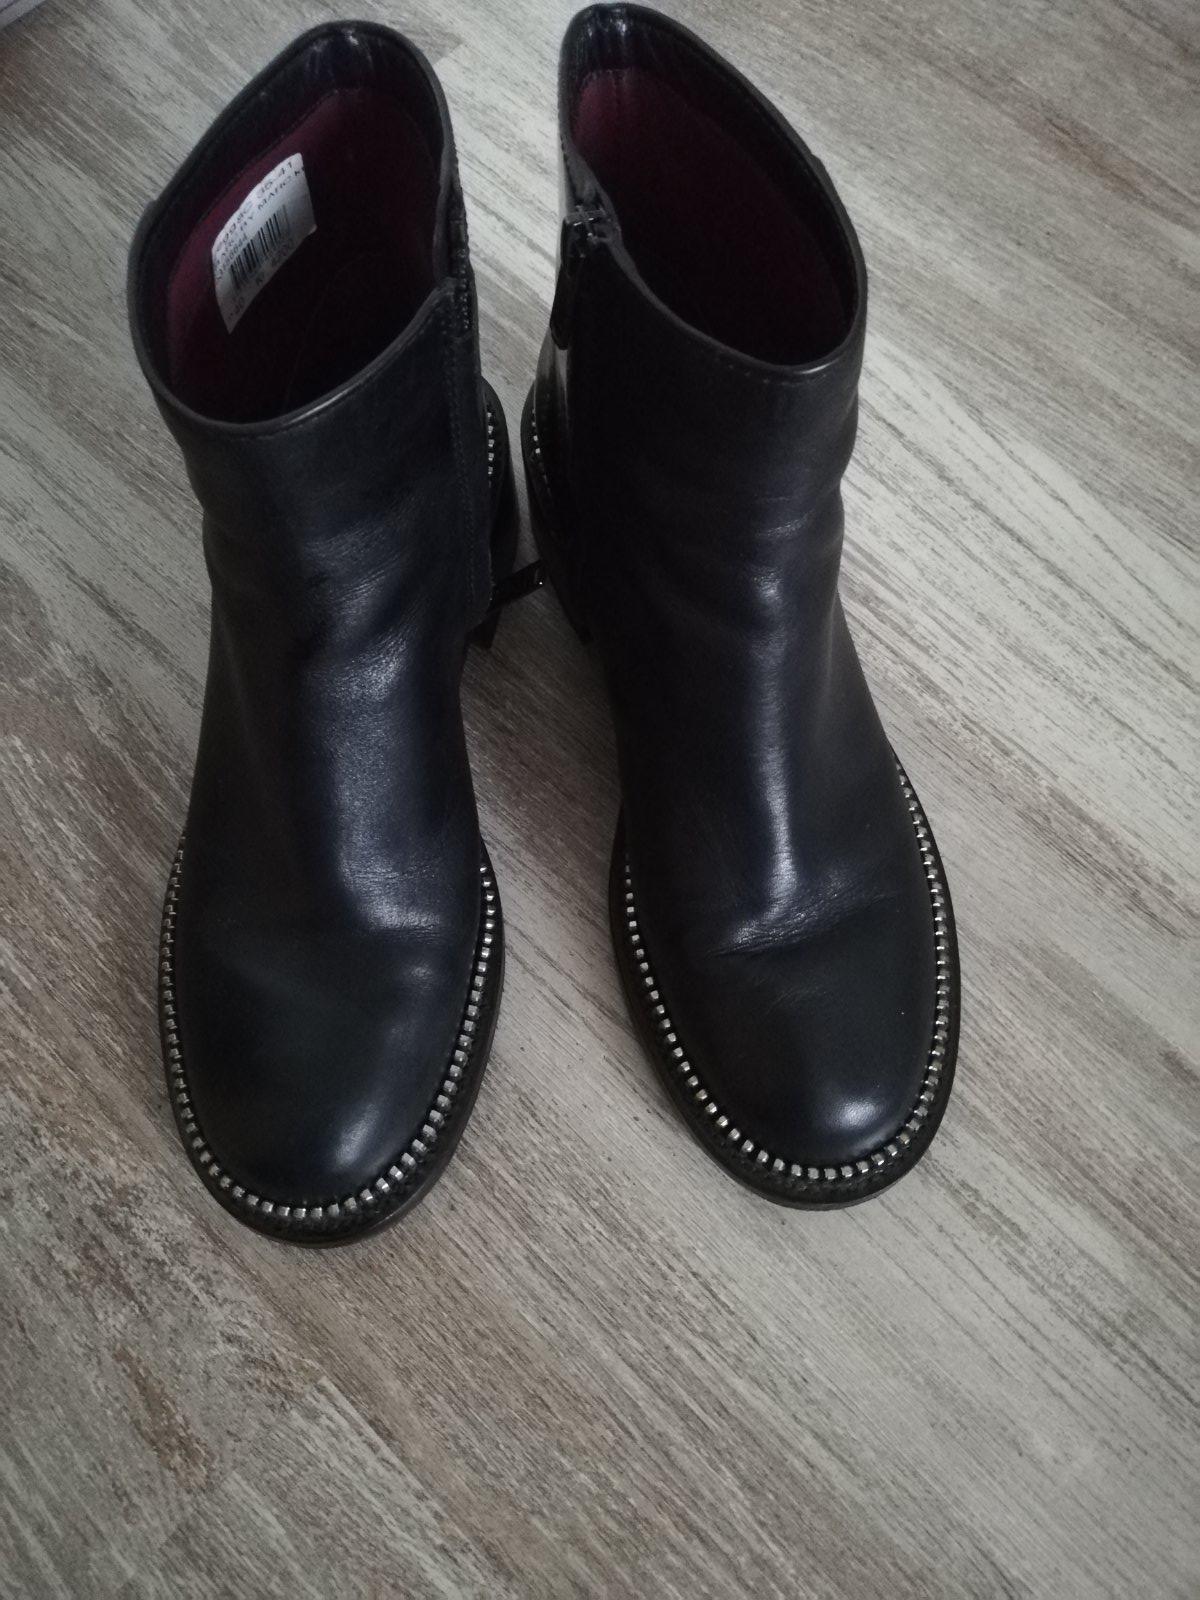 0eccde9f513d Topánky marc jacobs